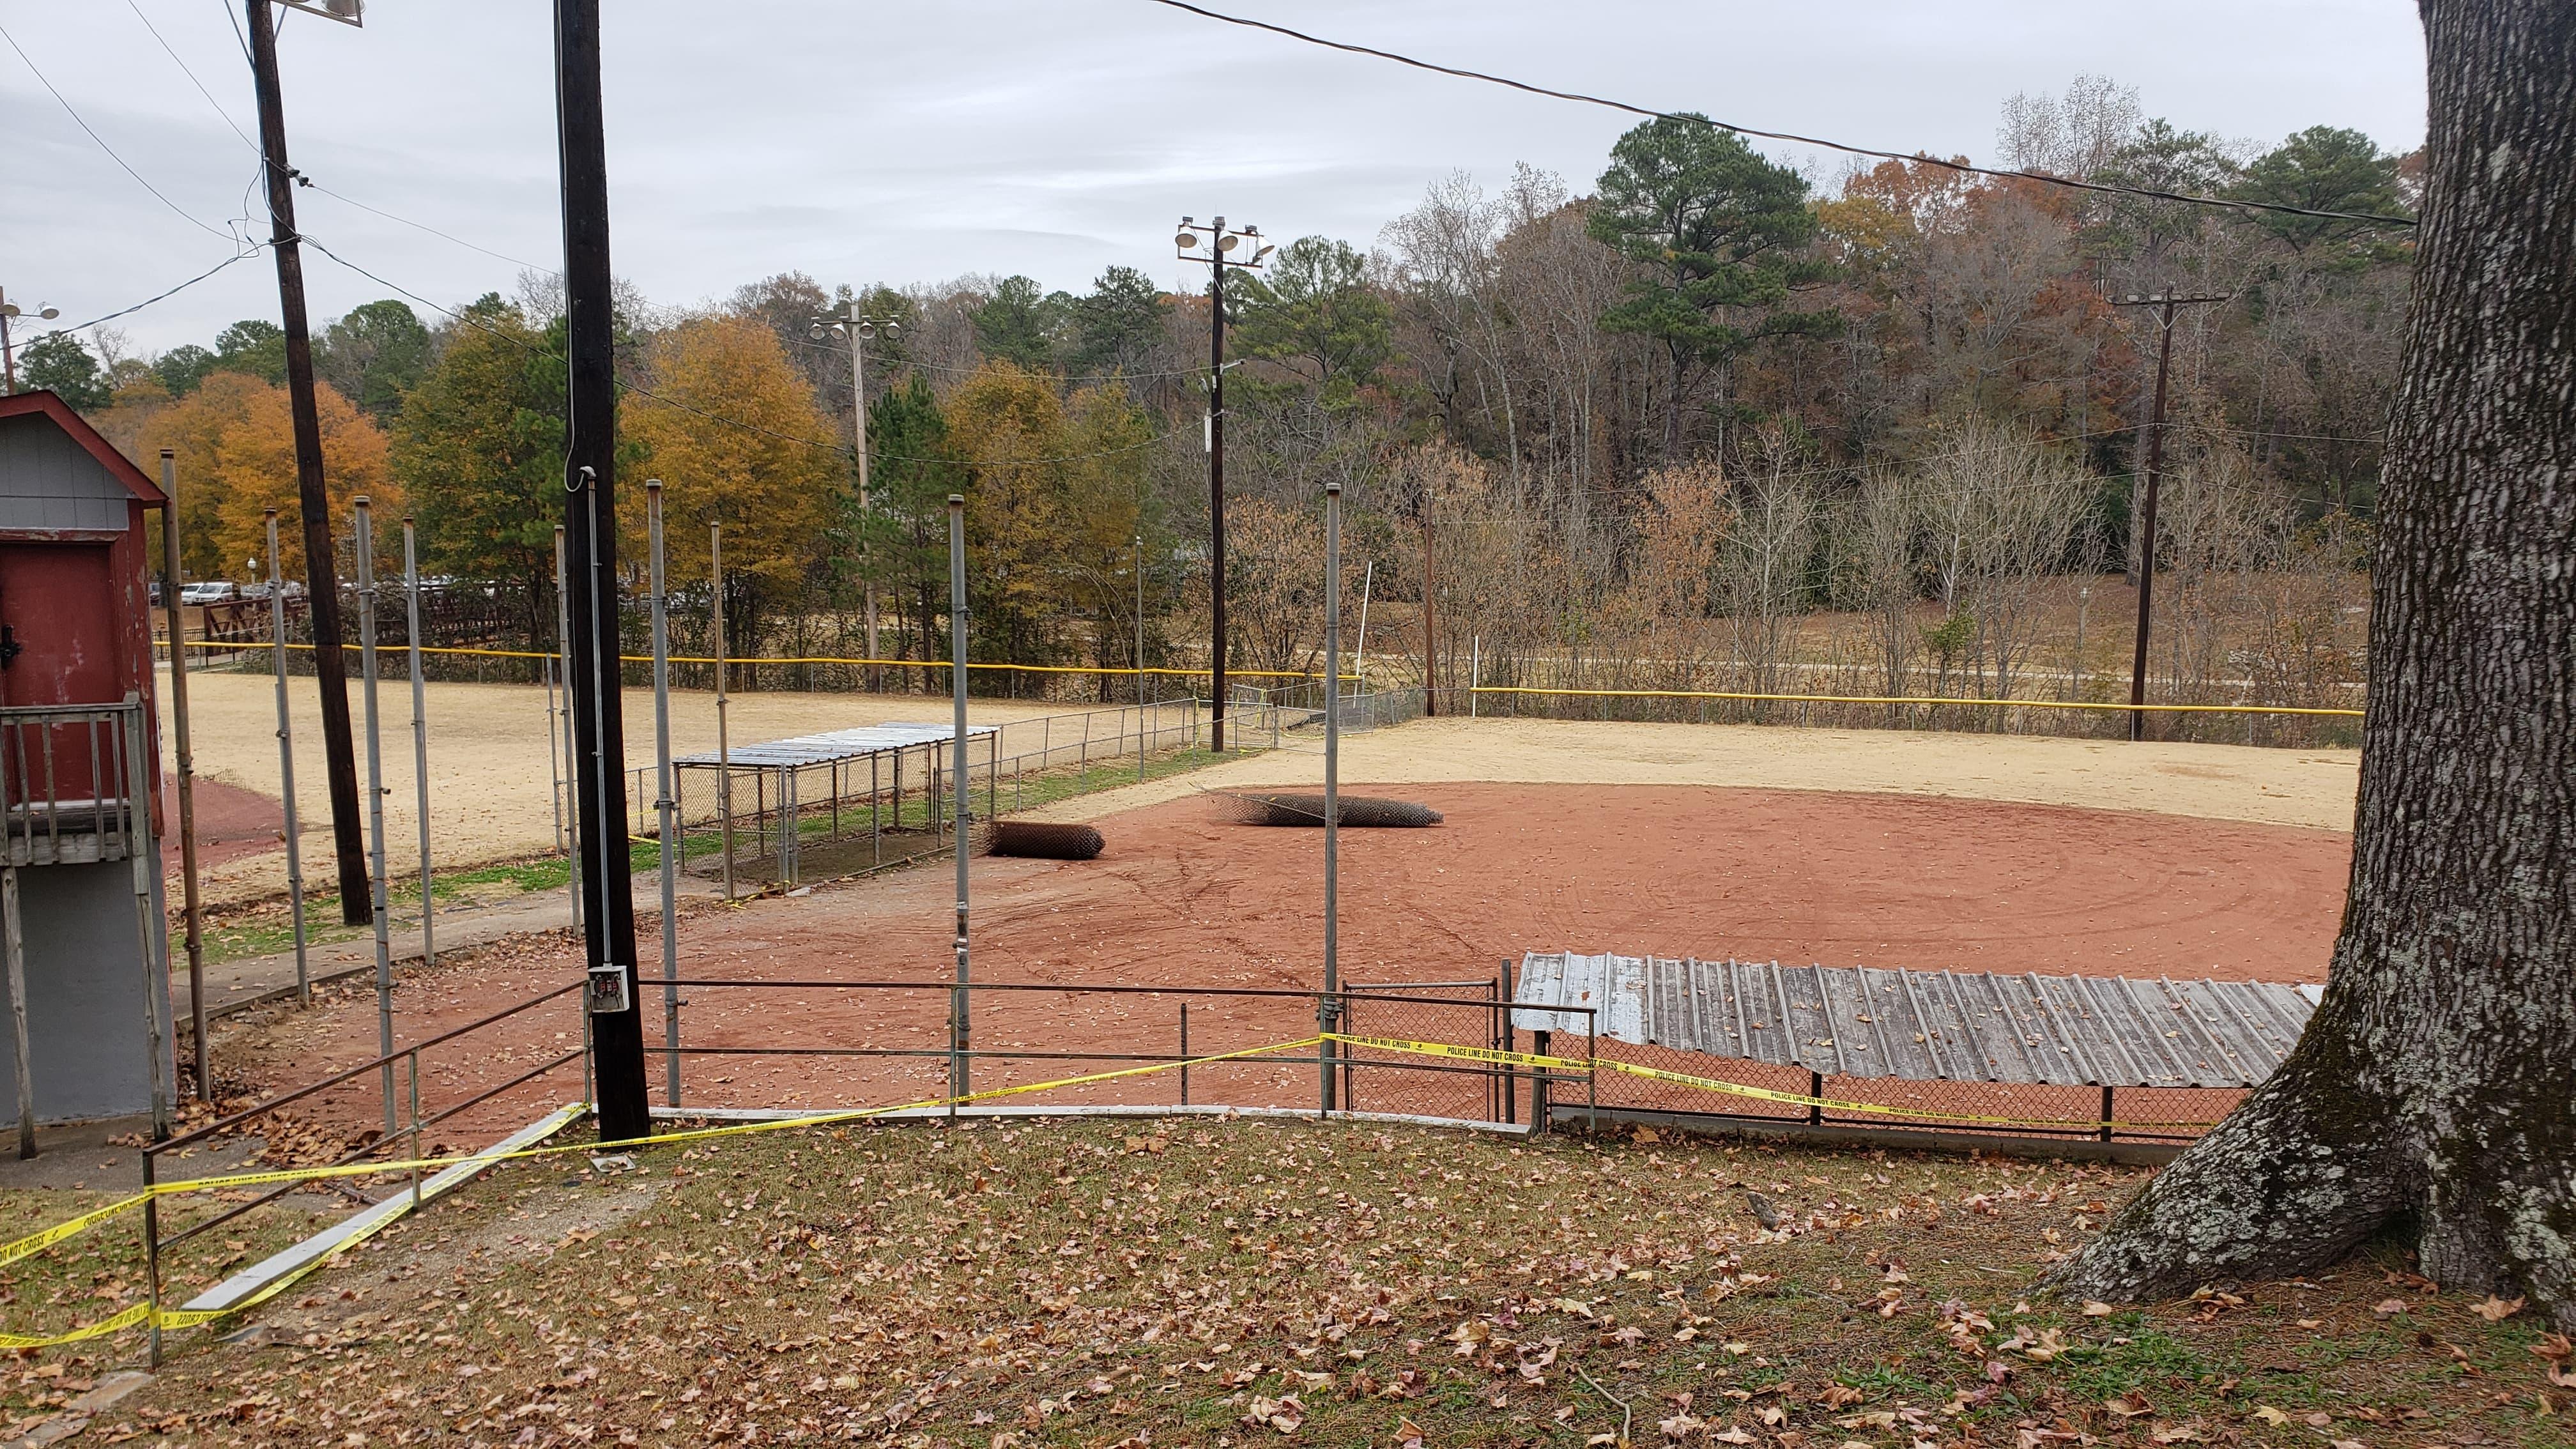 $175k grant to go towards revamp of ball fields in Trussville